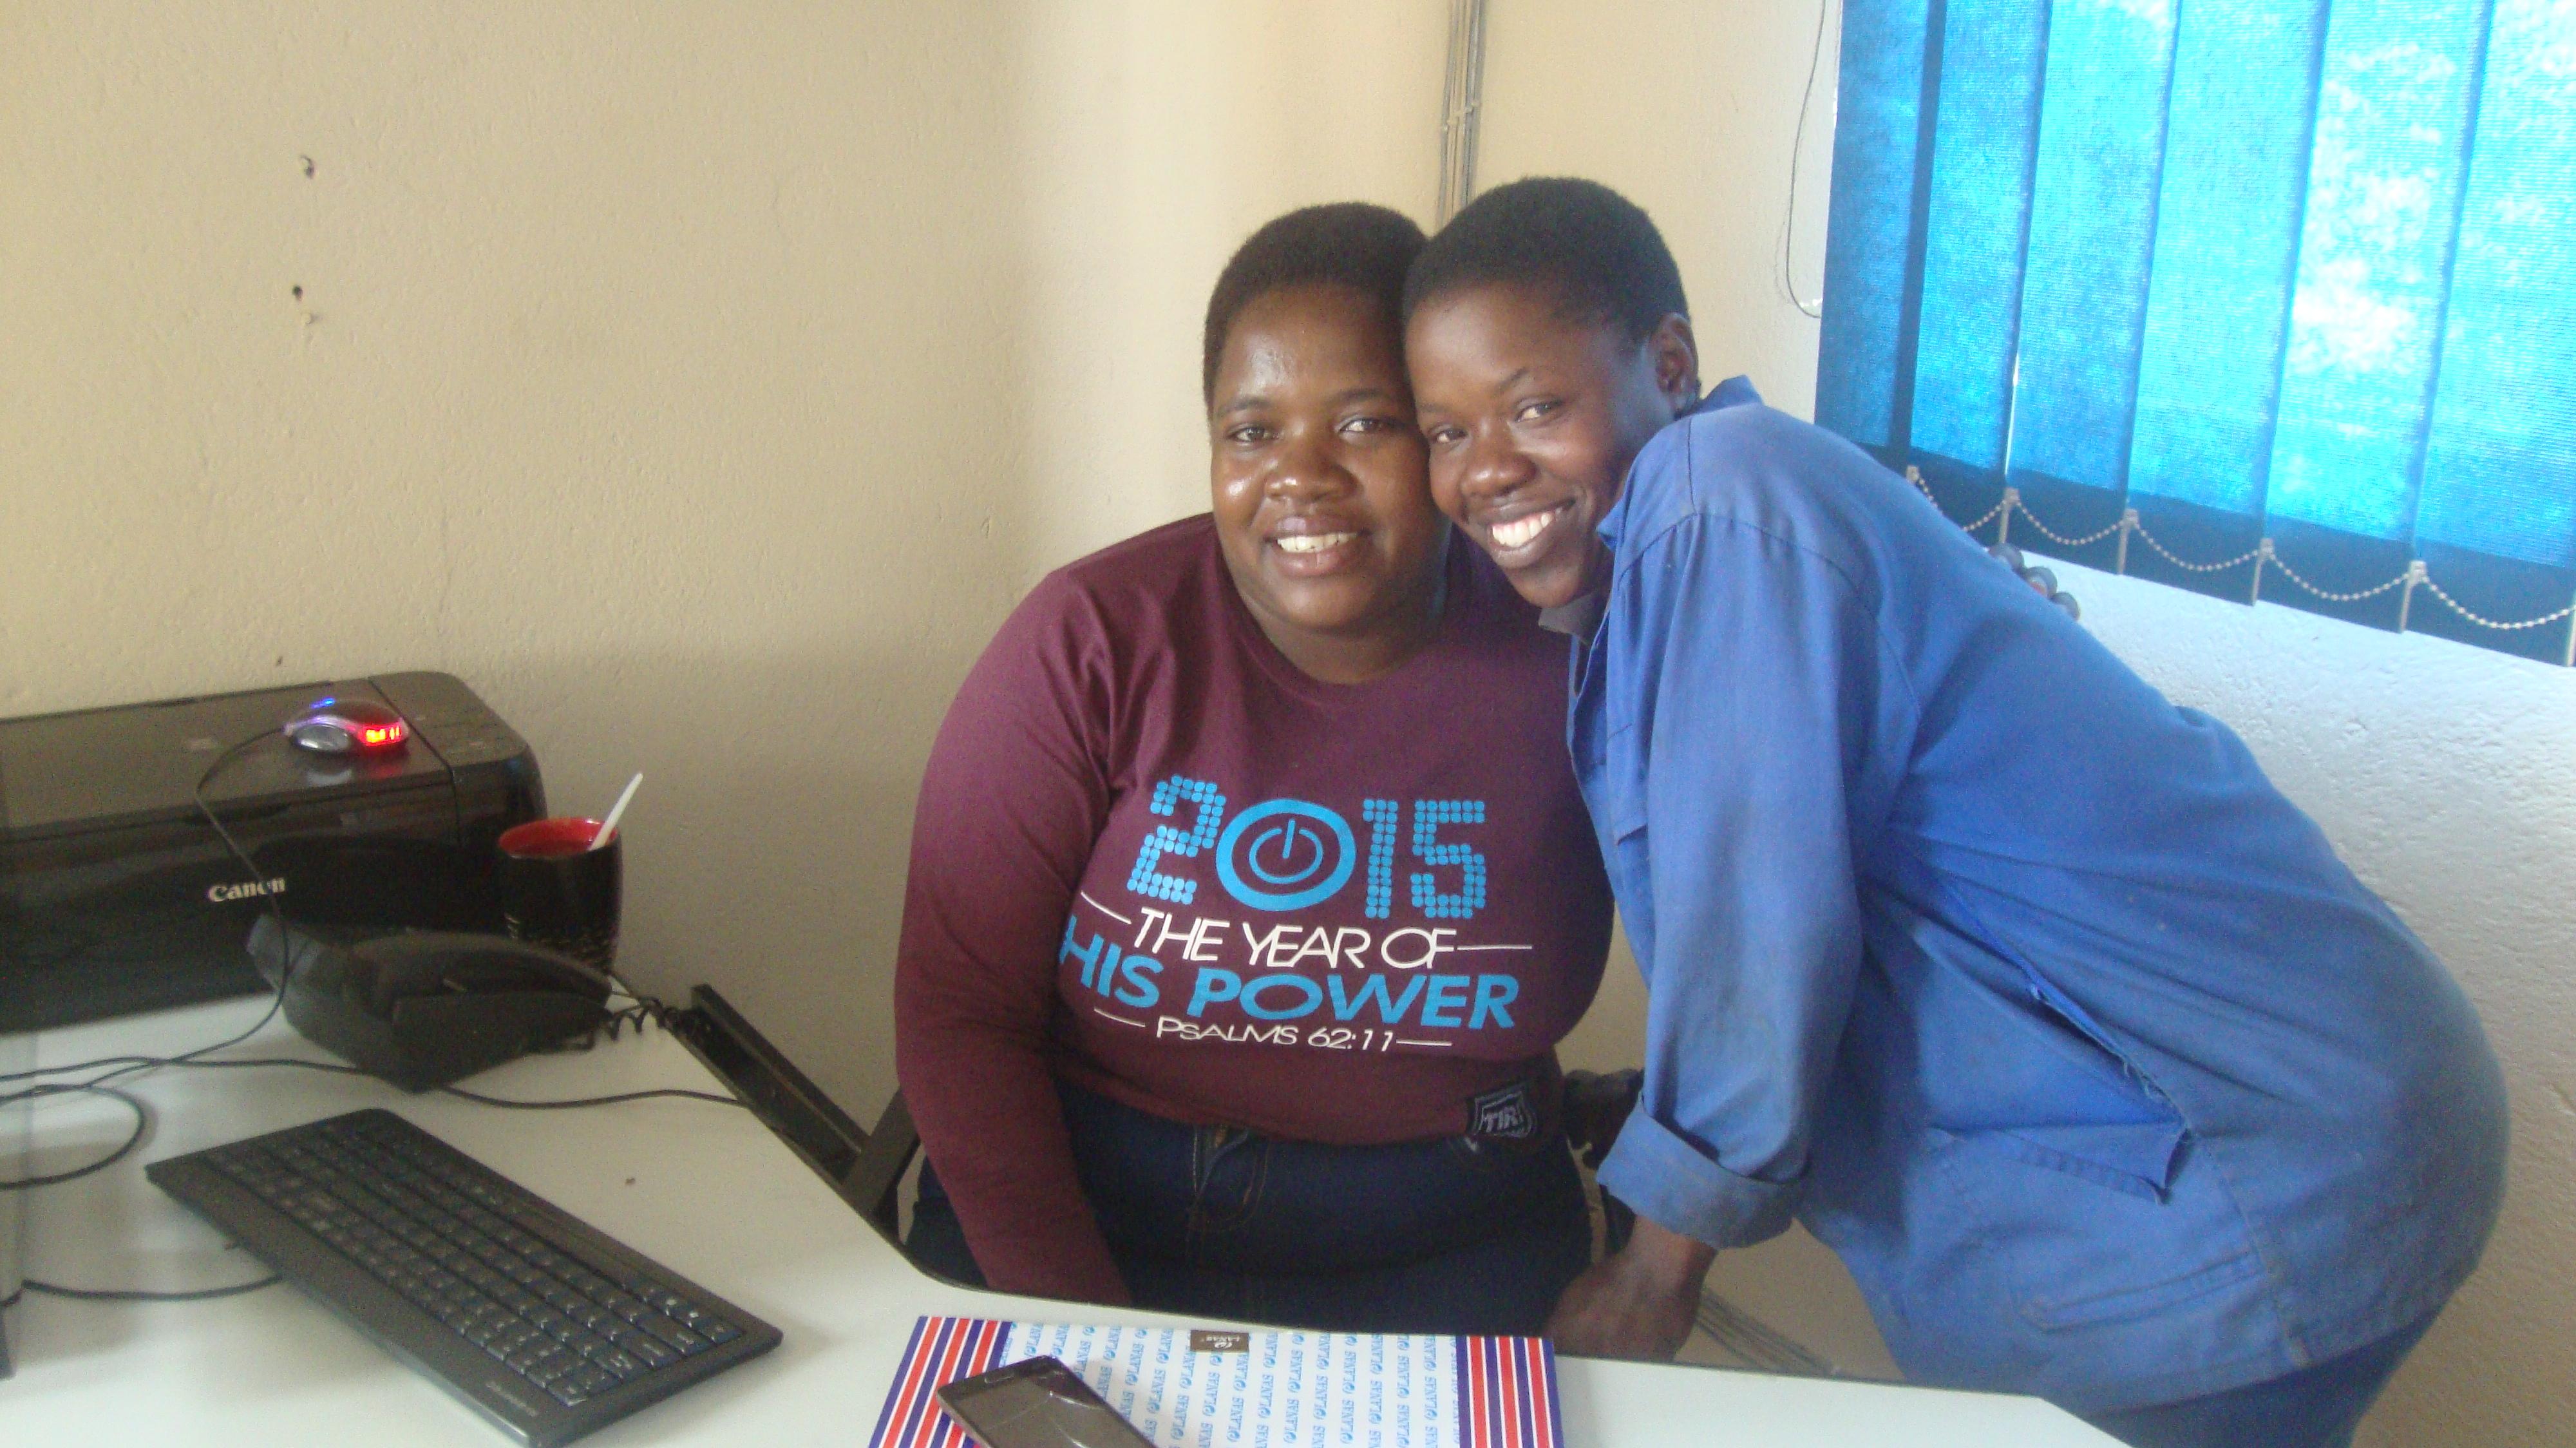 Giveth with Ms. Palmar, Harare, ZImbabwe